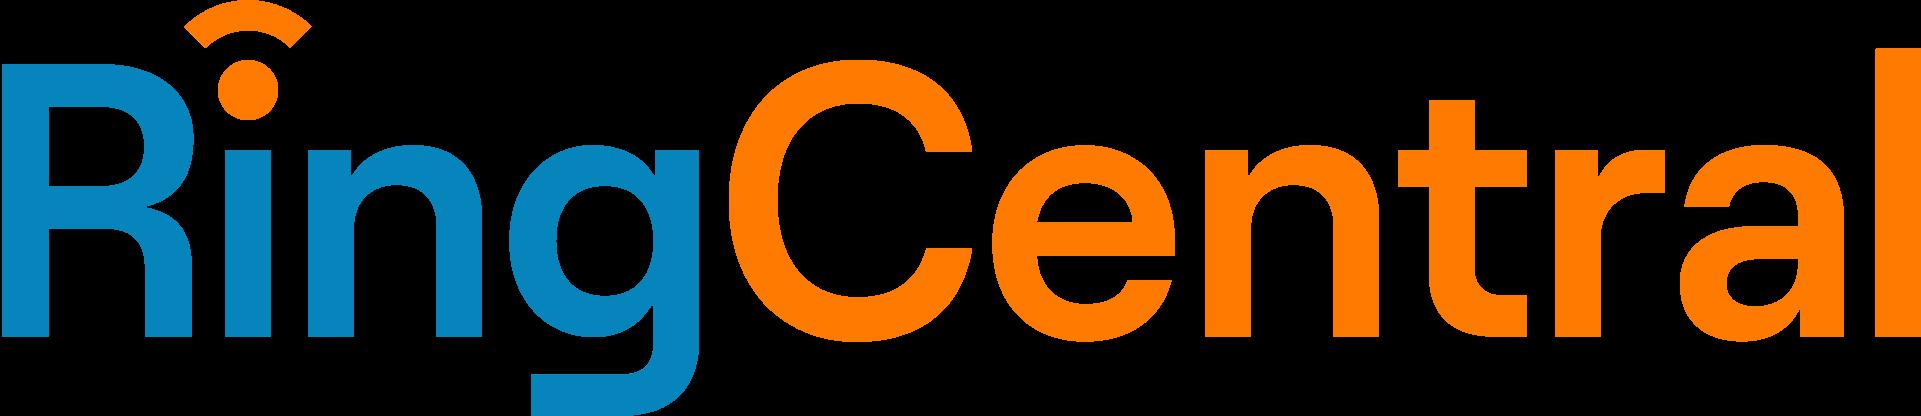 ringcentral_2.0_logo_POS (002)